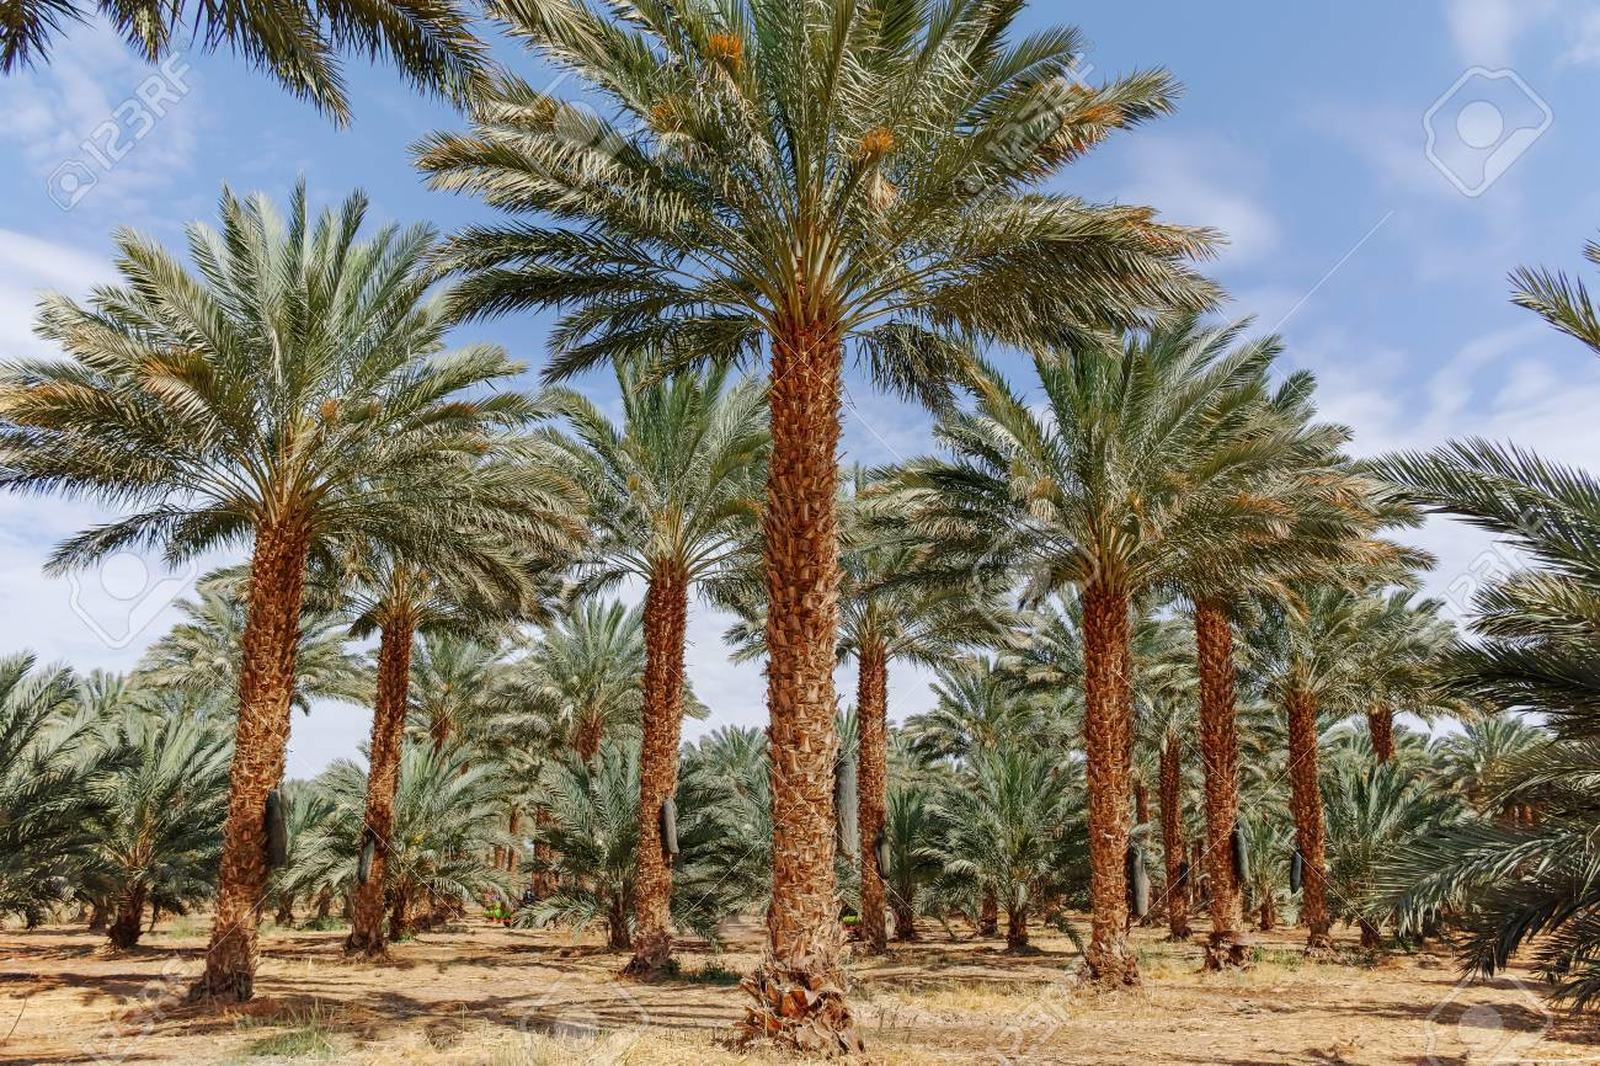 Palmeira Tamareira